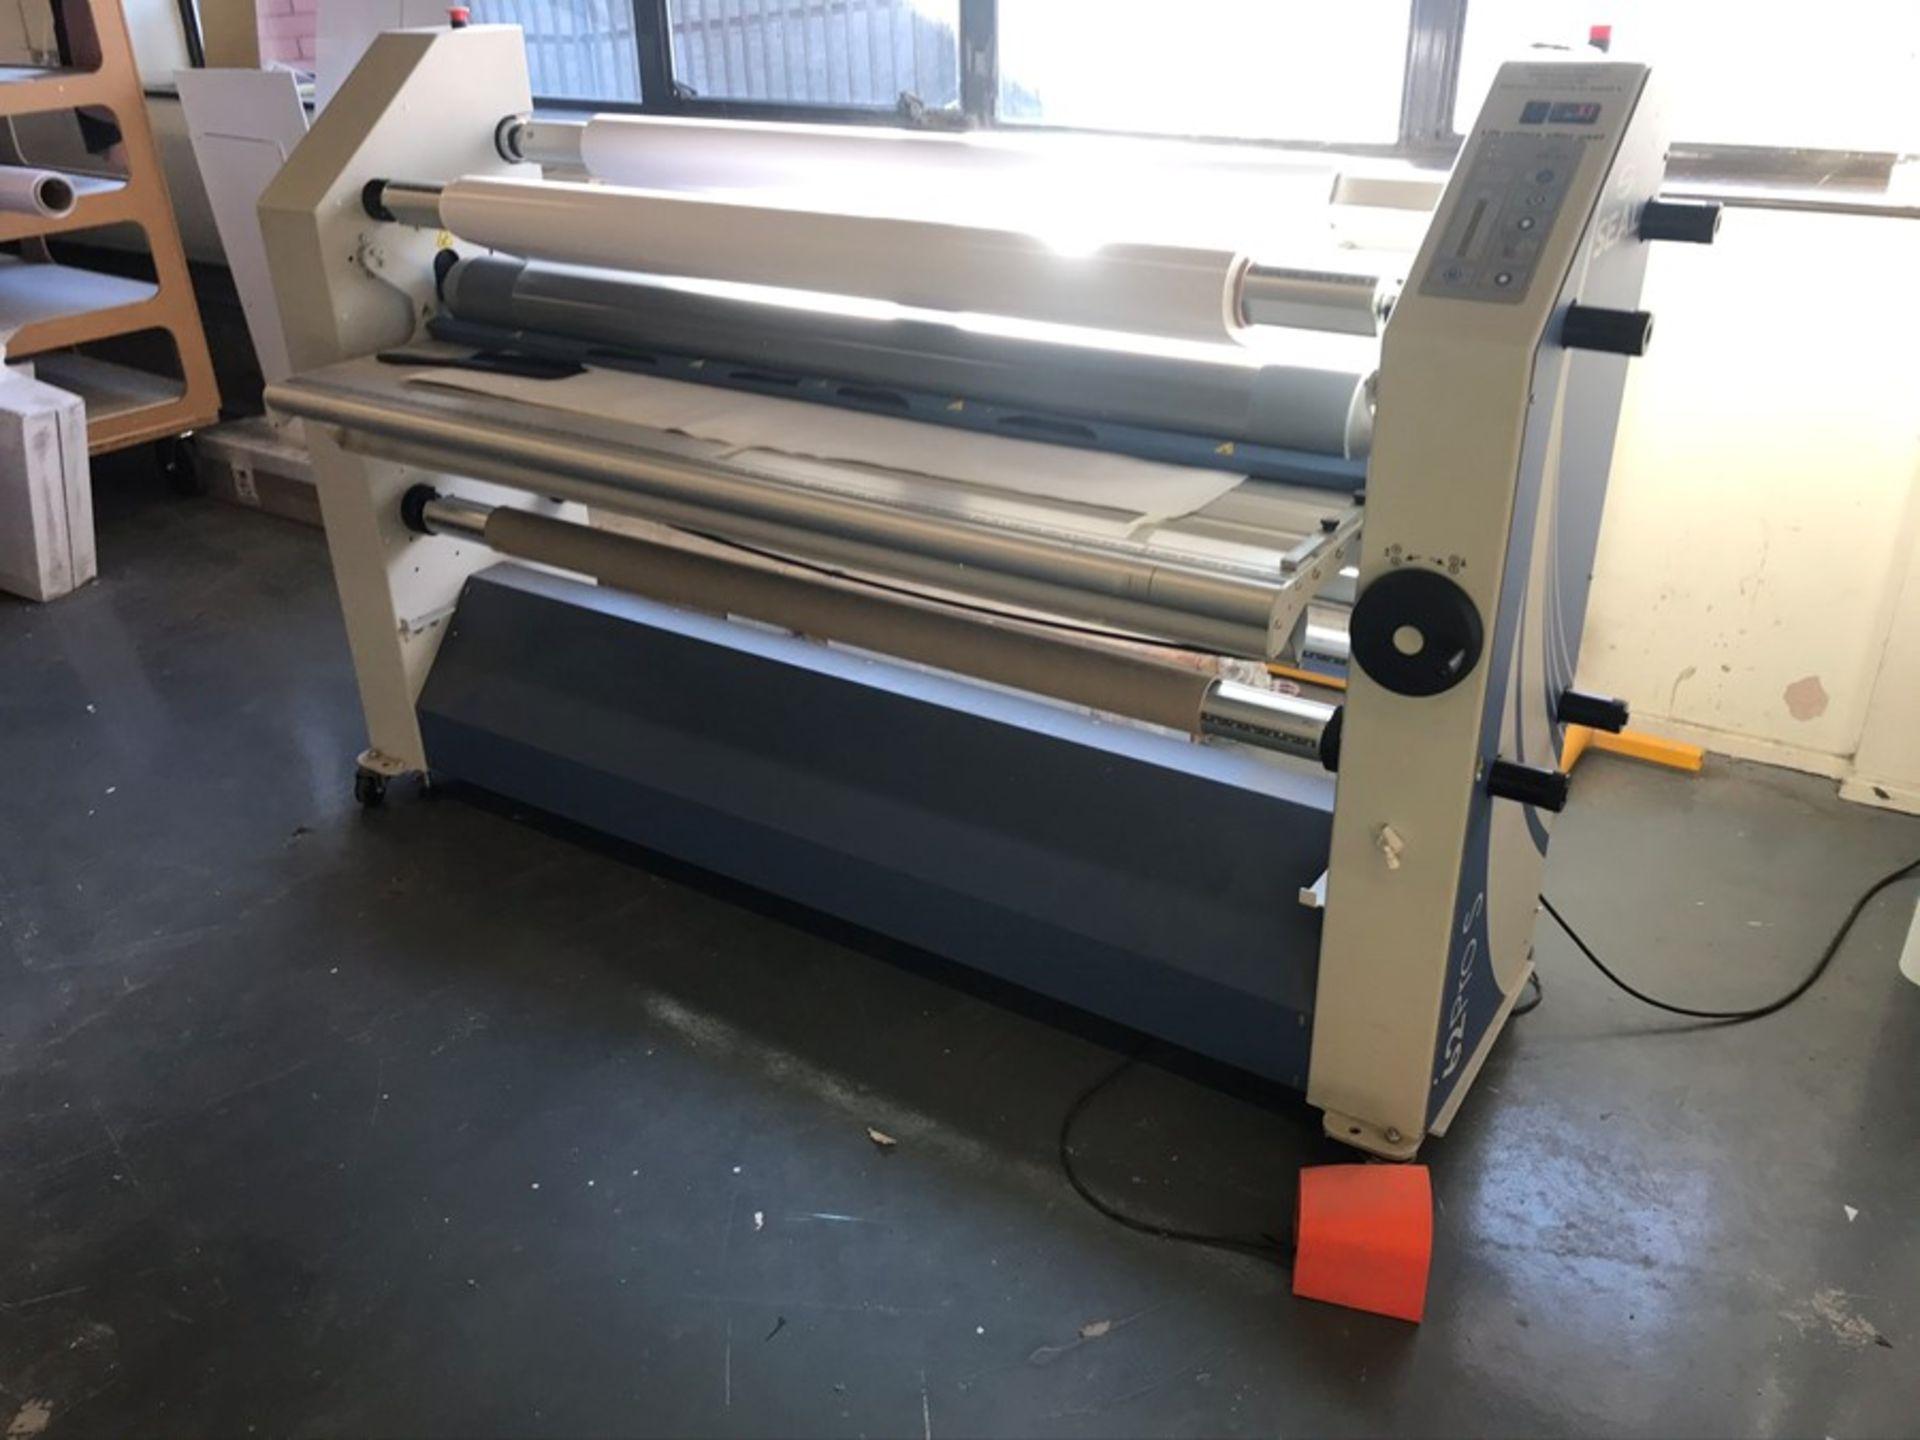 Seal 62S single heated laminator (2014) - Image 2 of 7